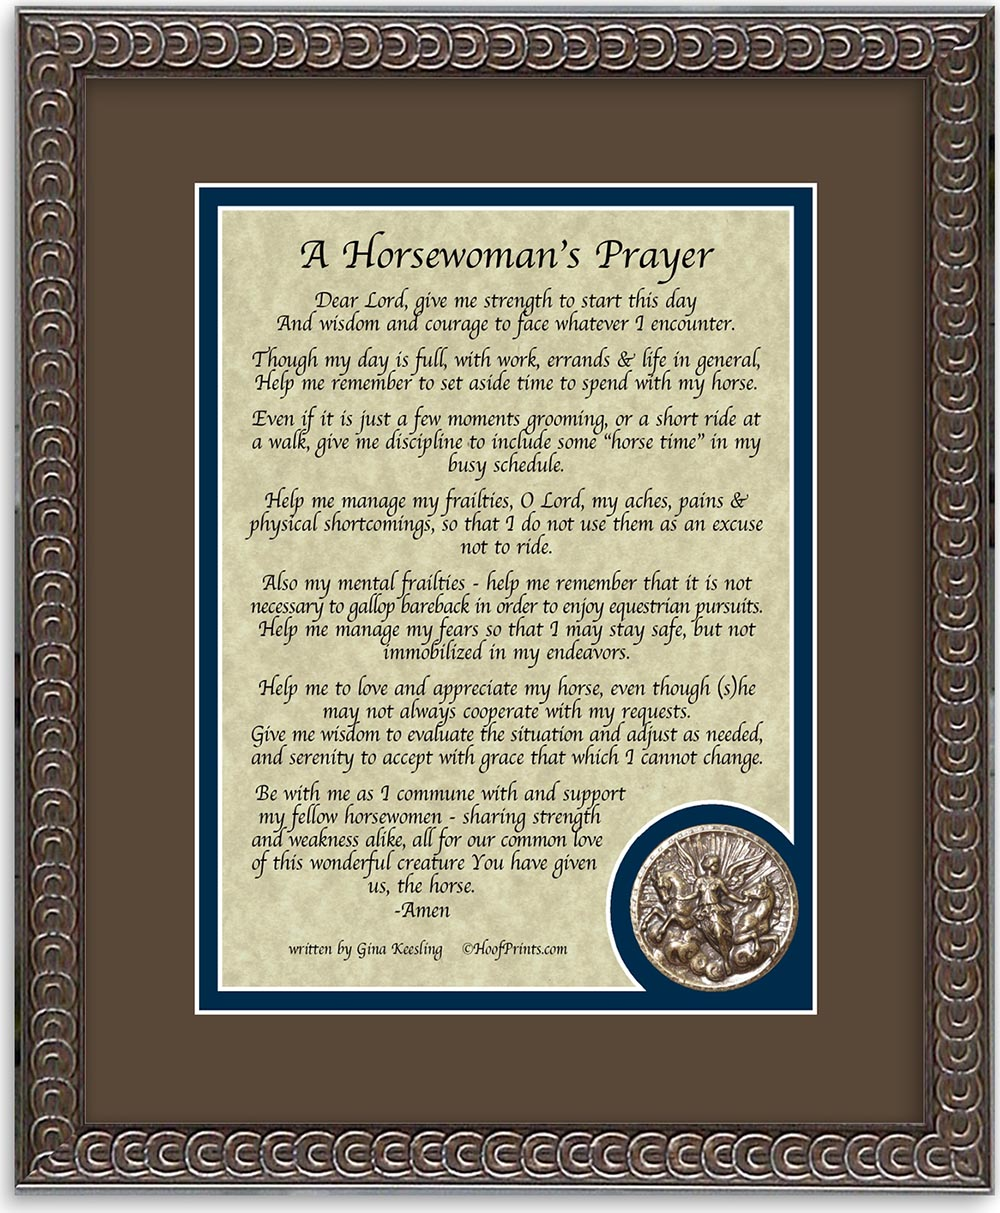 Horsewomans Prayer Framed Verse With Medallion-www